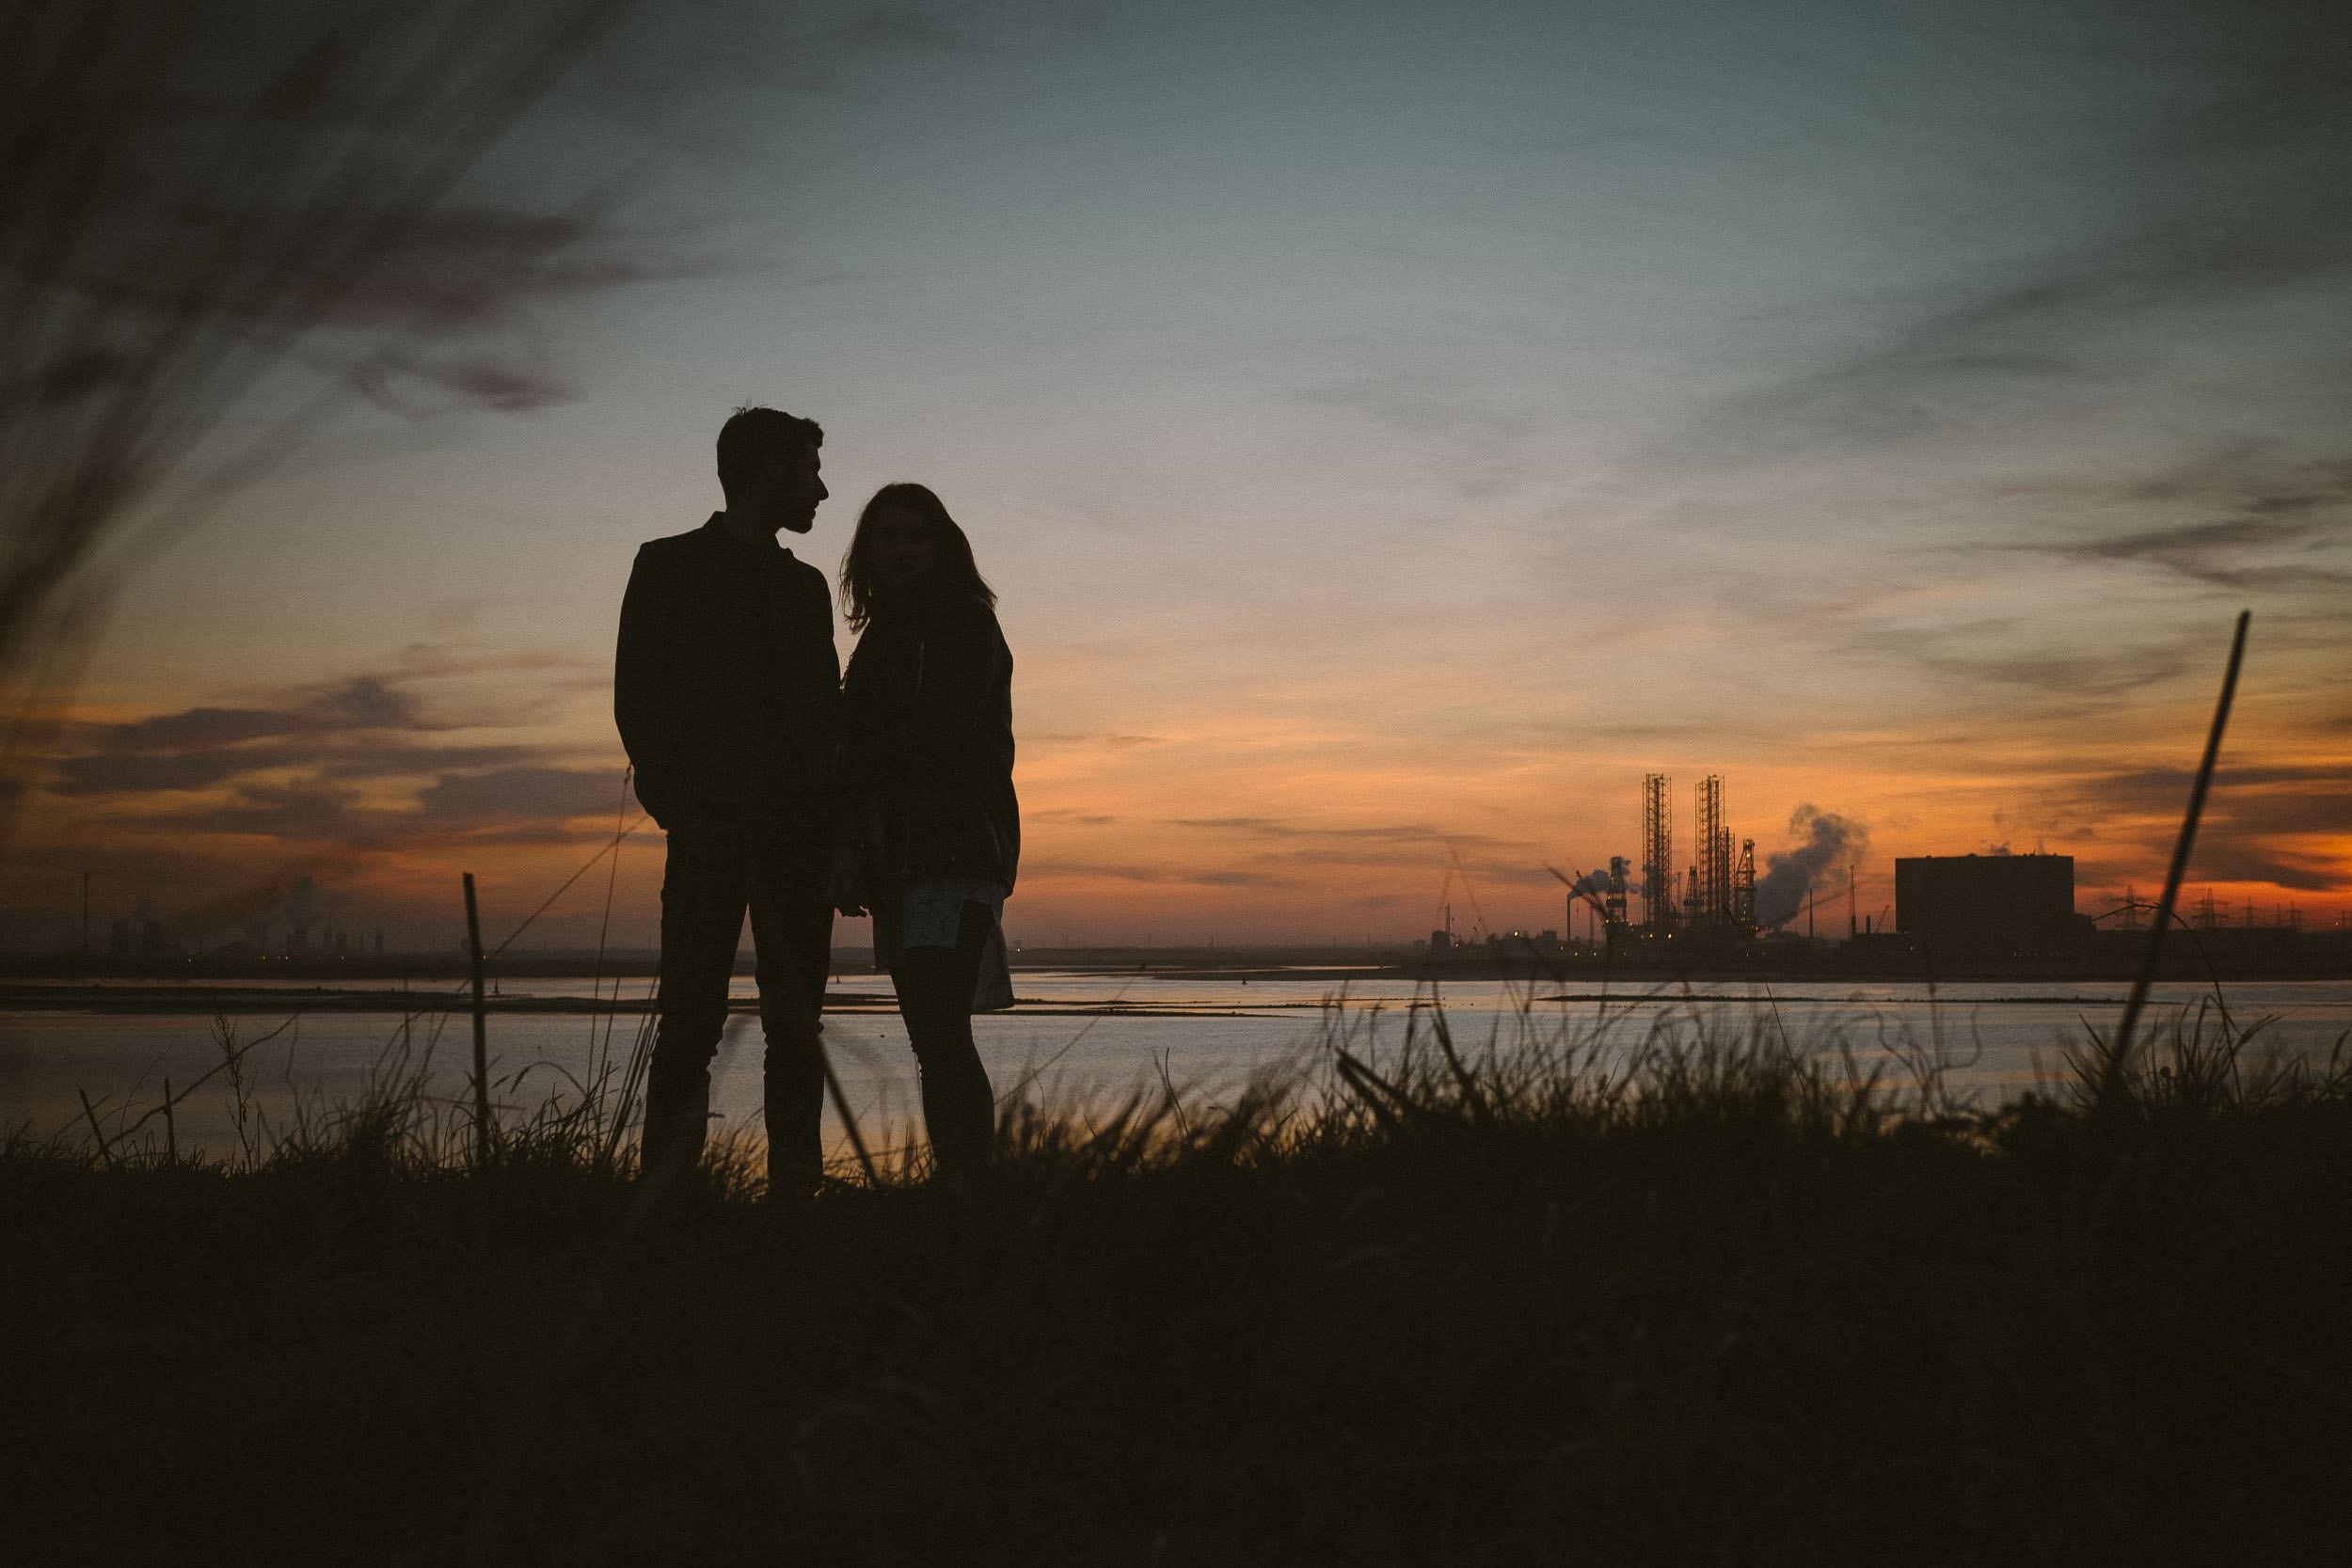 Silhouette of couple at sunset on Teeside coast